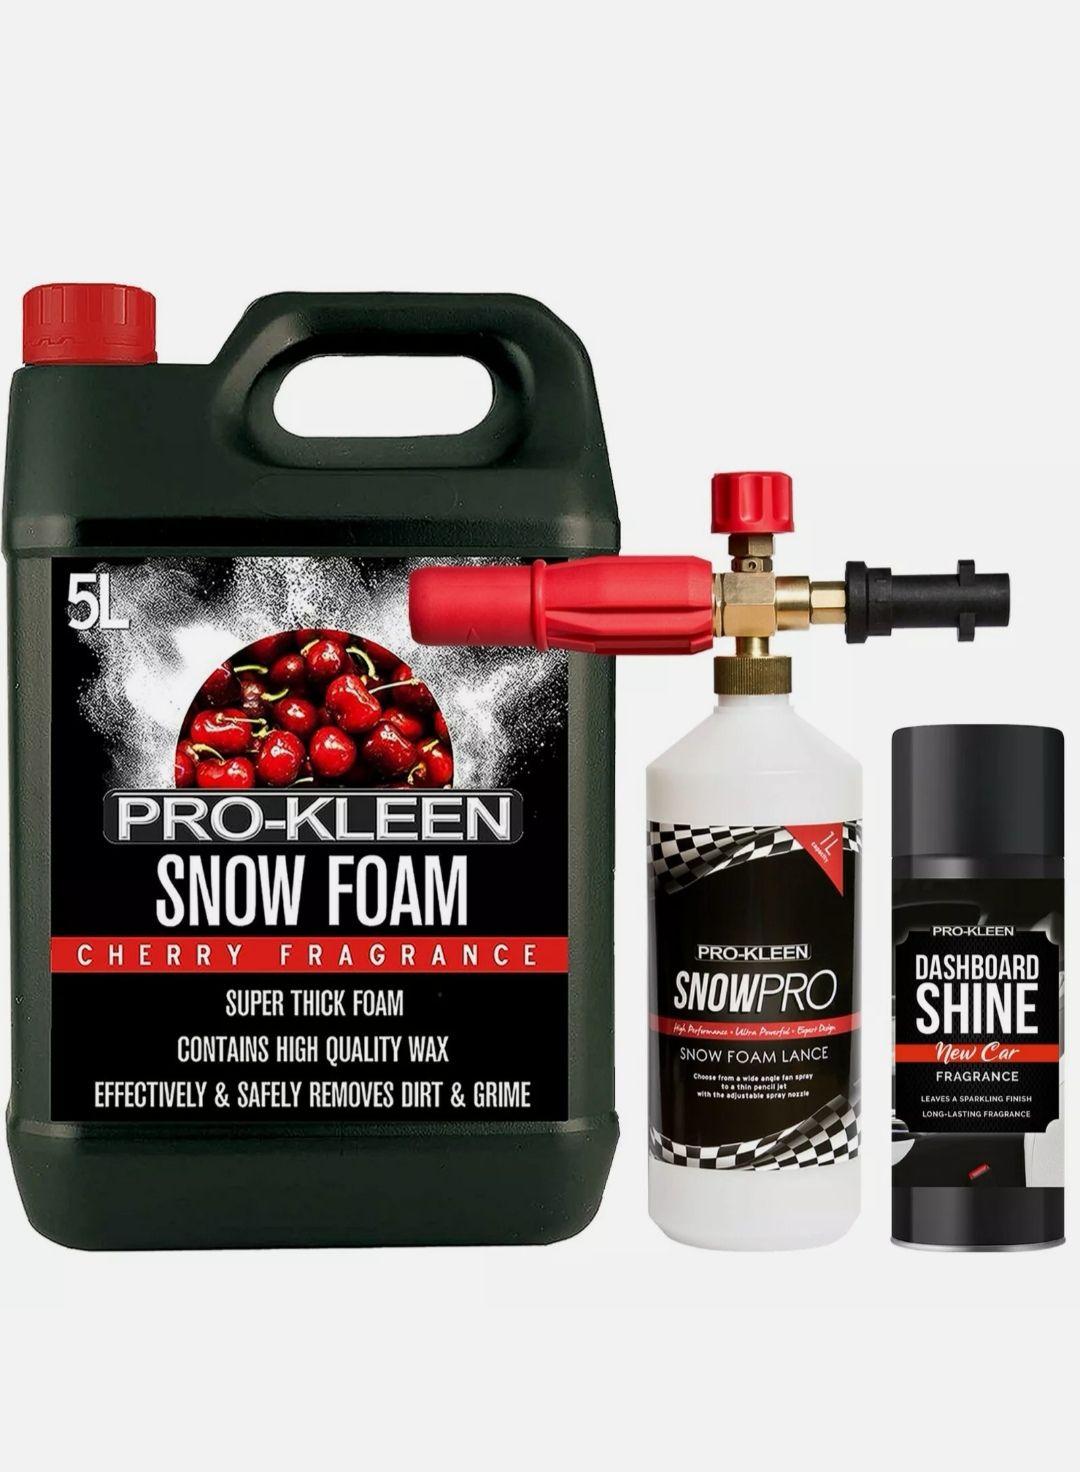 Pro-Kleen snowfoam lance karcher with 5L snowfoam solution £24.76 (UK mainland) @ hsd-online / eBay